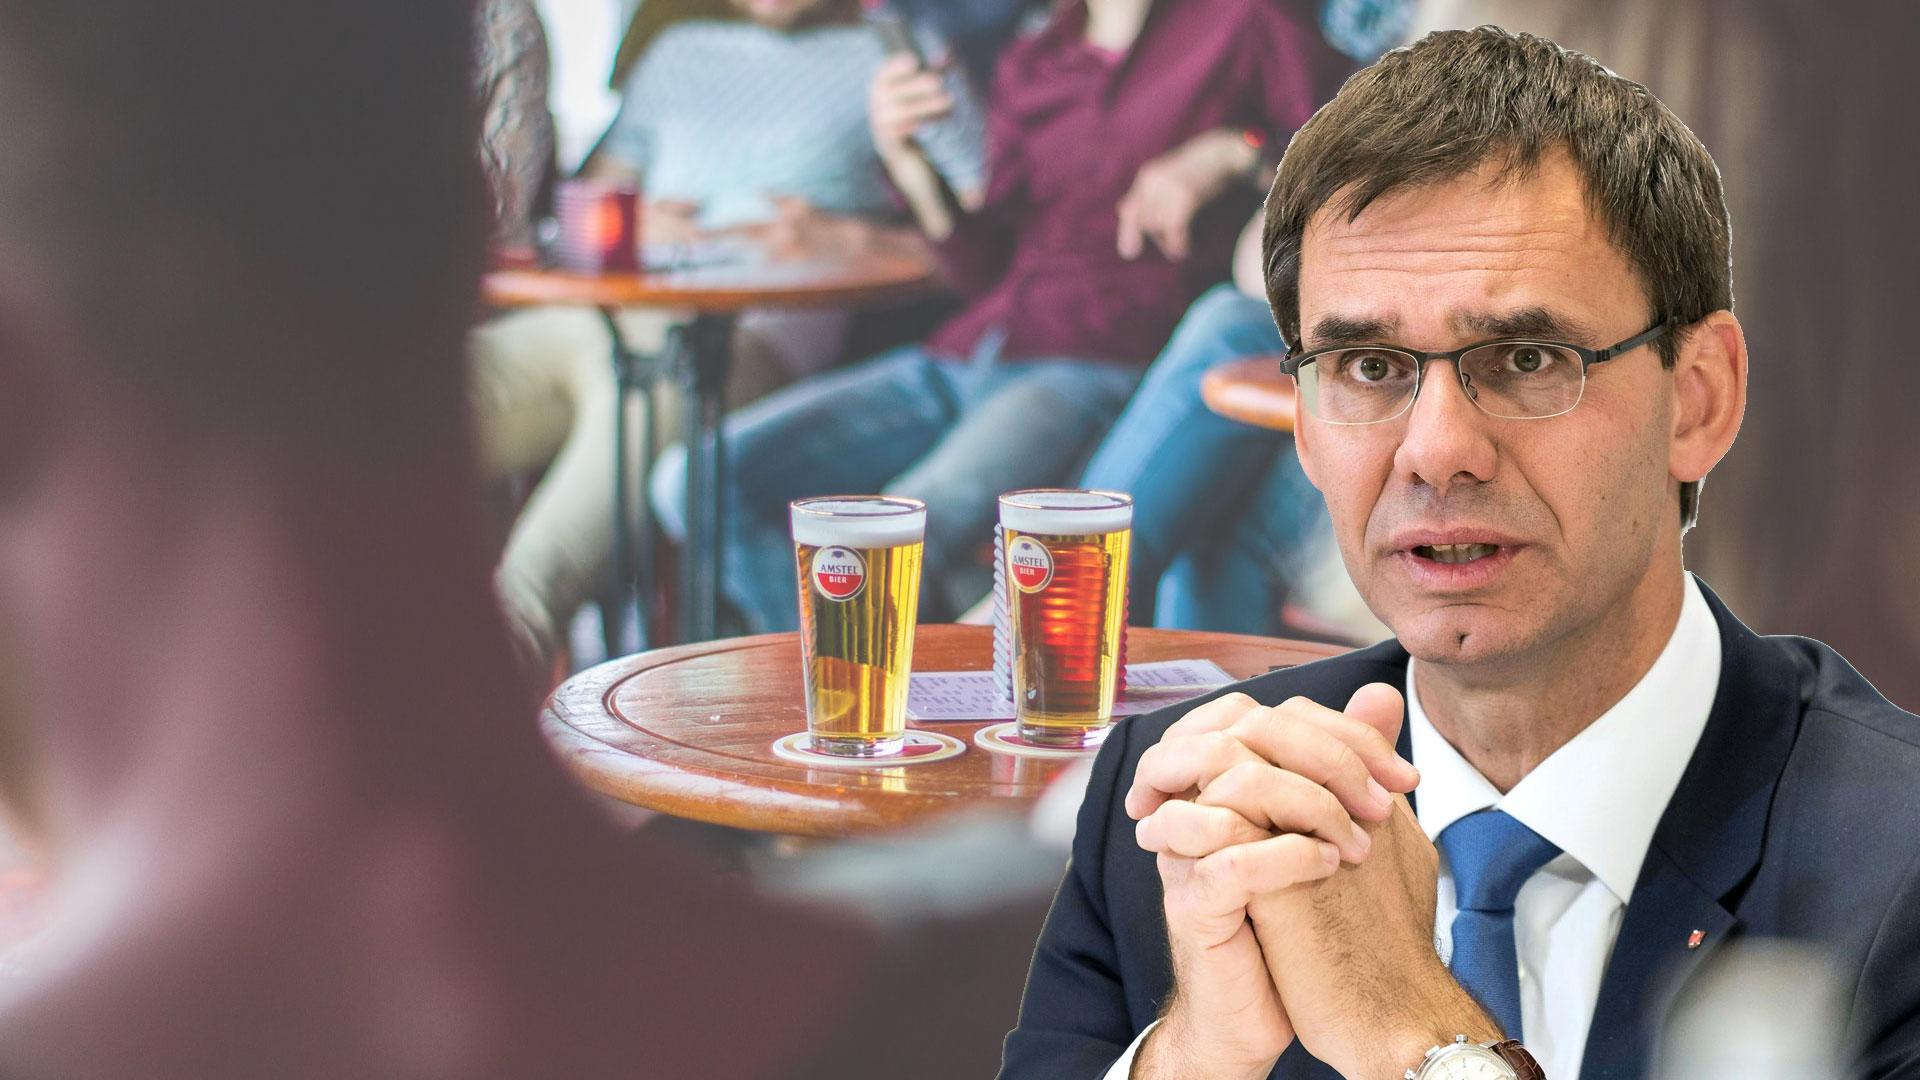 Corona: Lokale in Vorarlberg schließen nun um 22 Uhr